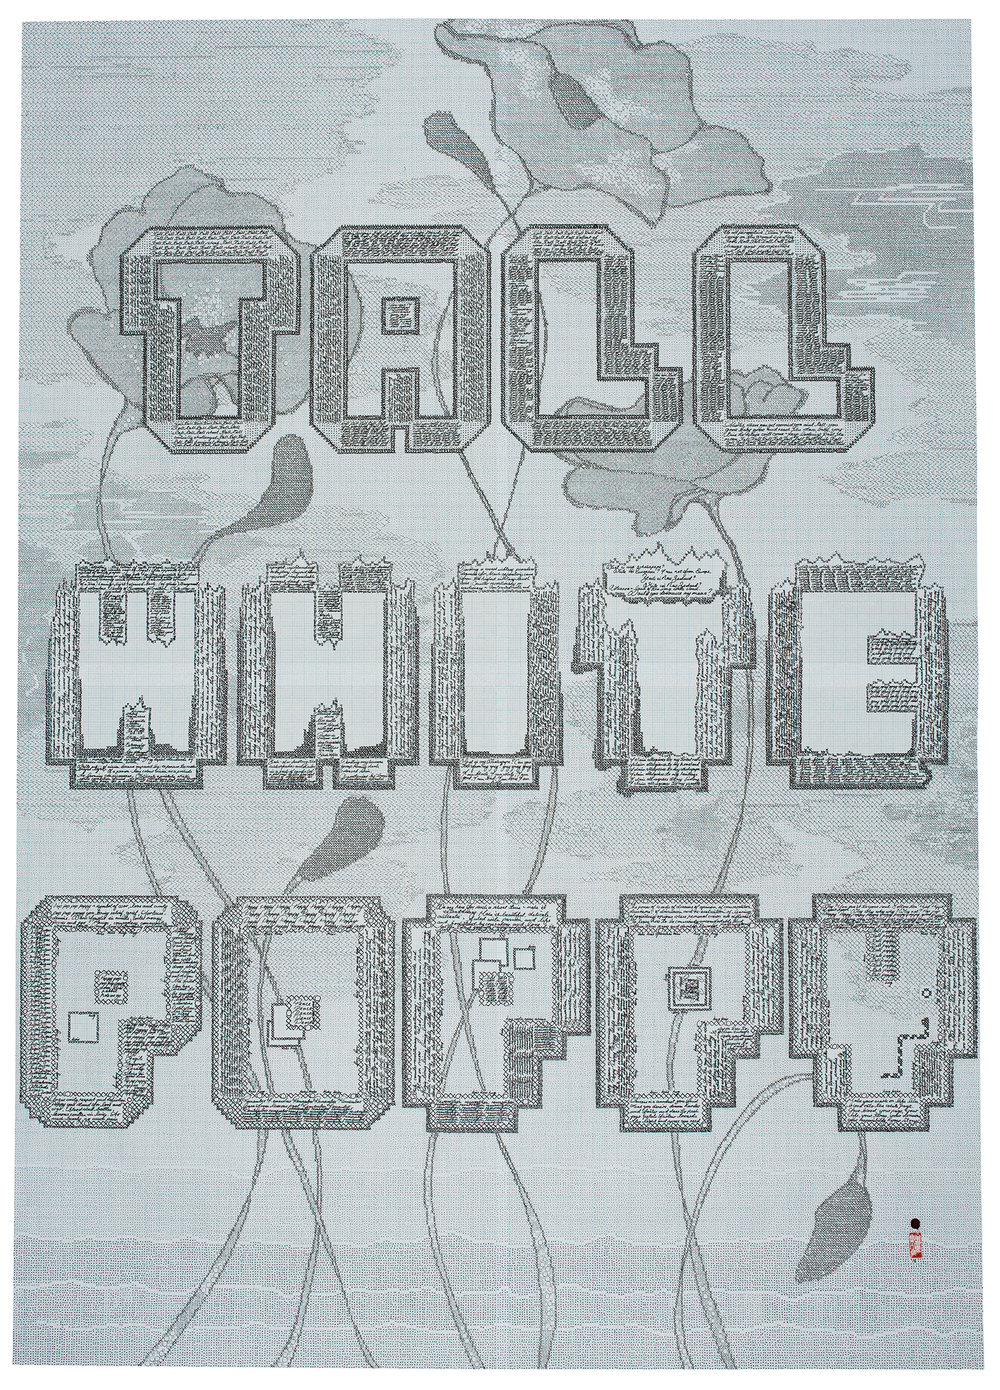 'Tall White Poppy' , Staedtler pigment liner, hanko & wax signature, 800 x 1120mm, 1/1, 2016